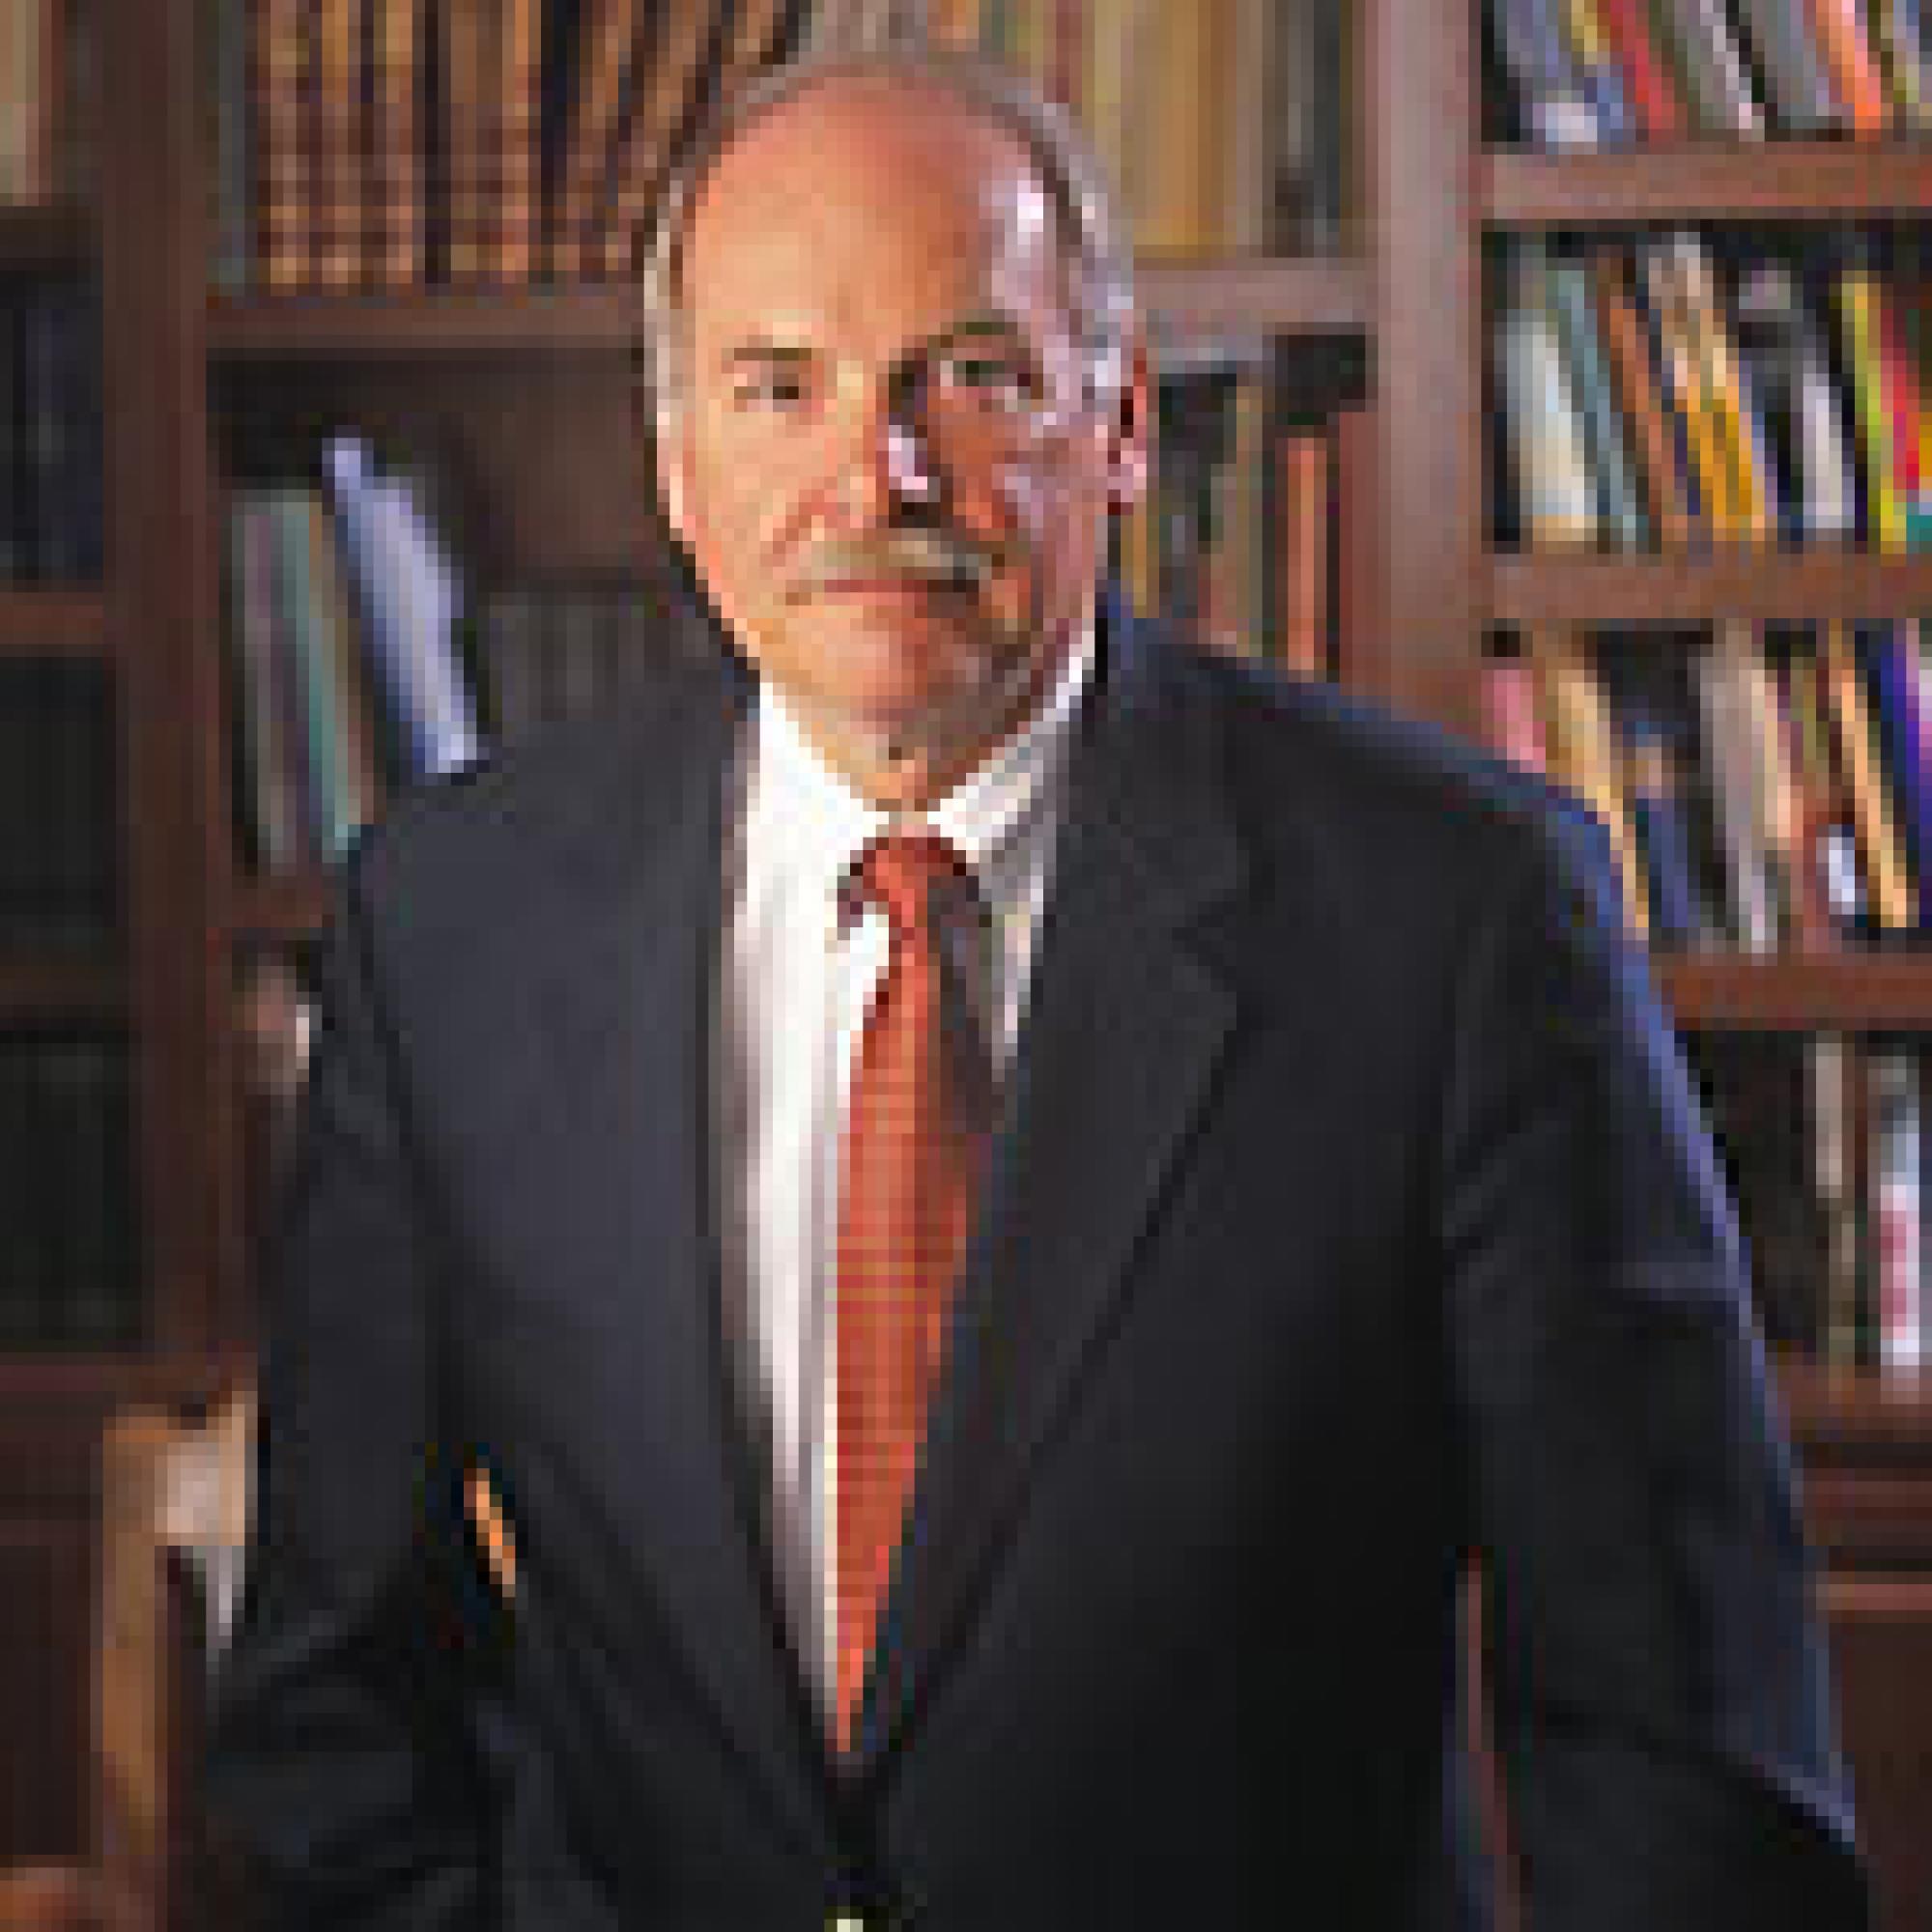 University of Arizona President Emeritus John P. Schaefer